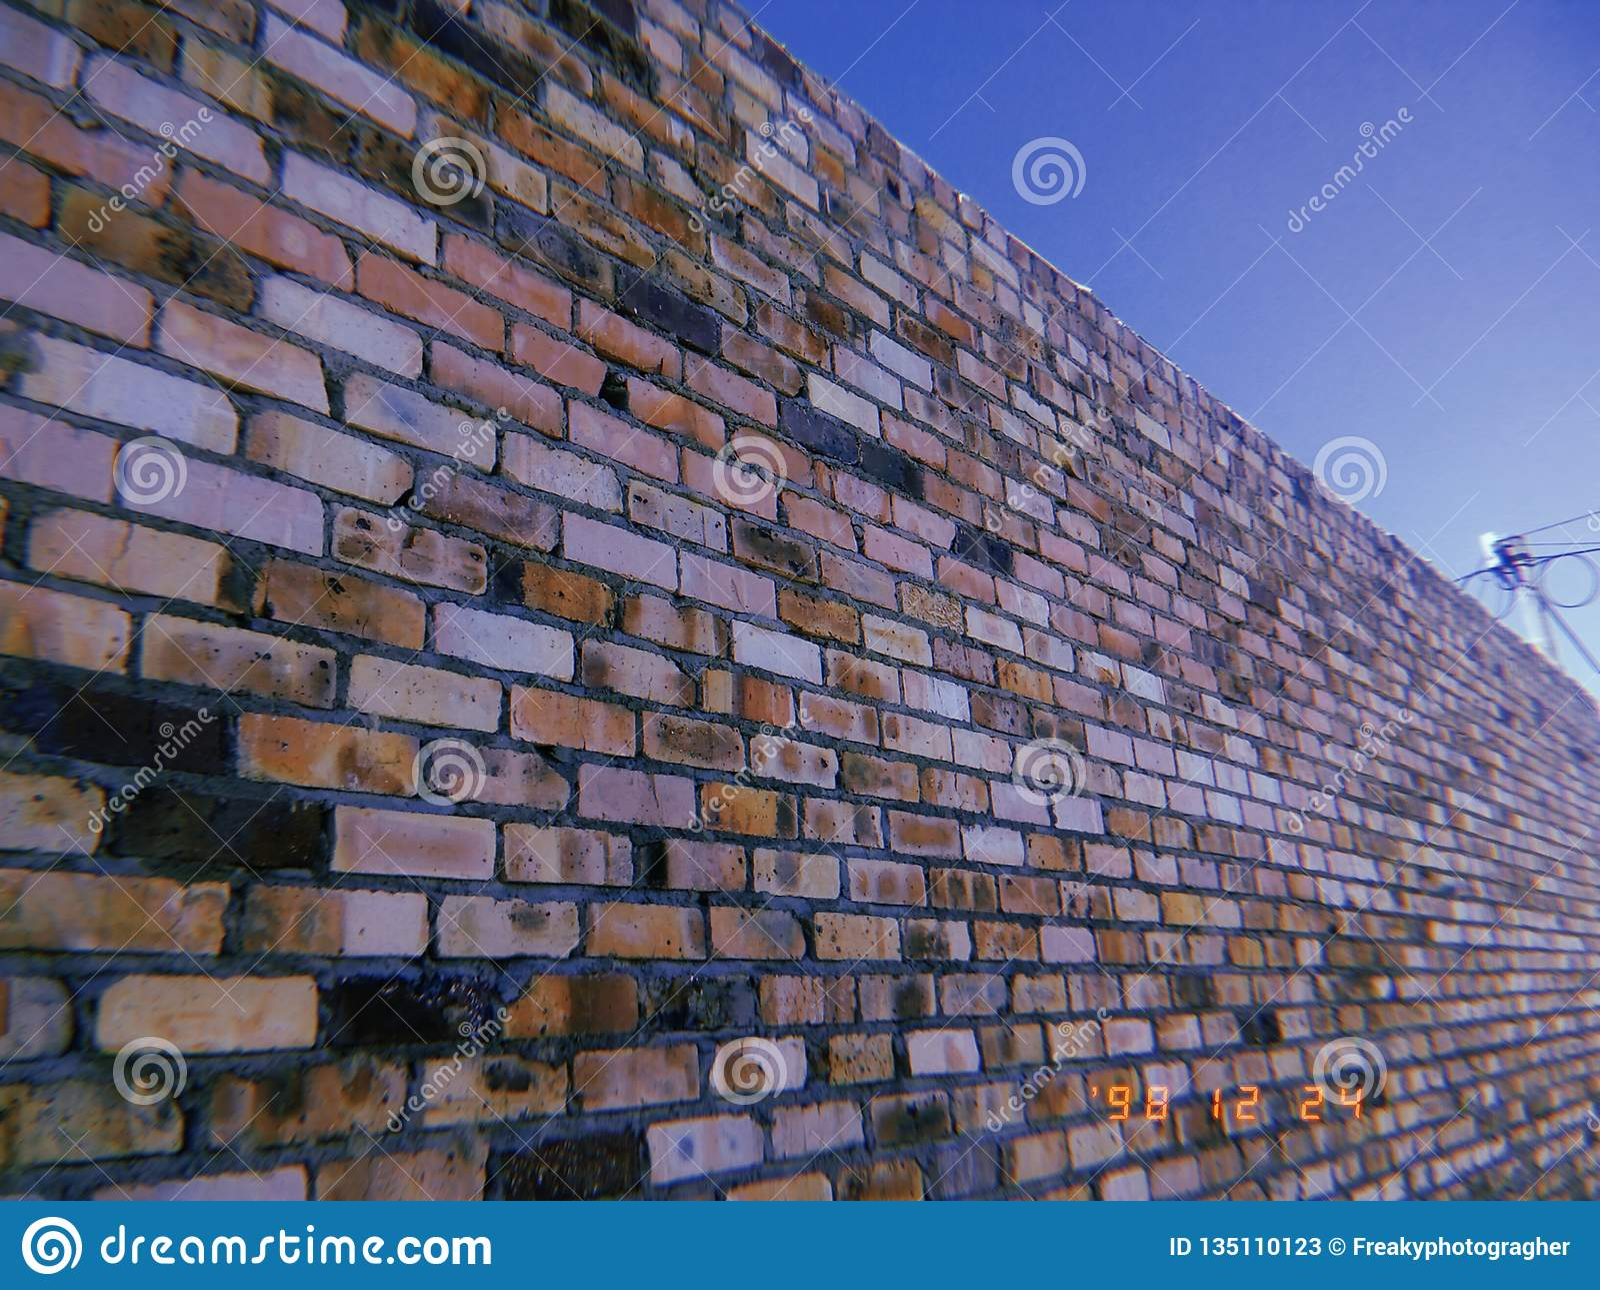 The highest brick wall